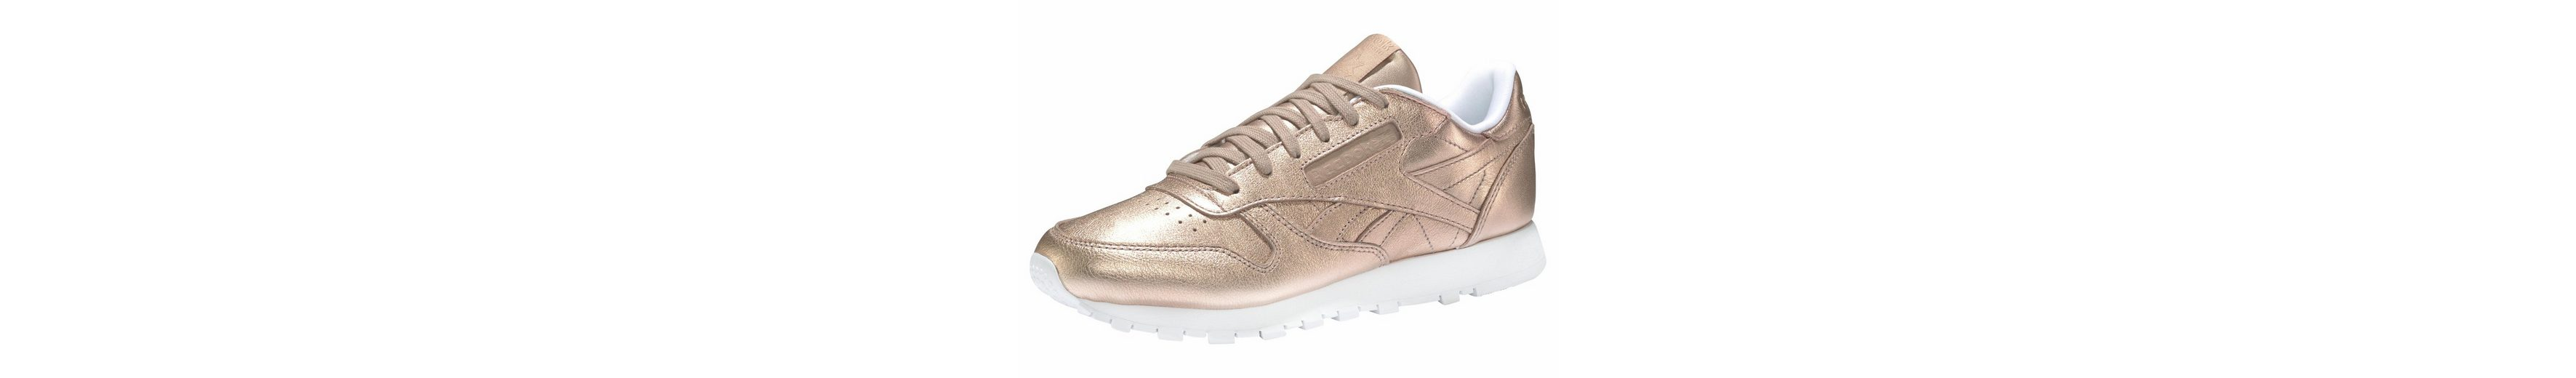 Reebok Classic Classic Leather Melted Metal Sneaker Günstiger Preis Top-Qualität vJZL4P